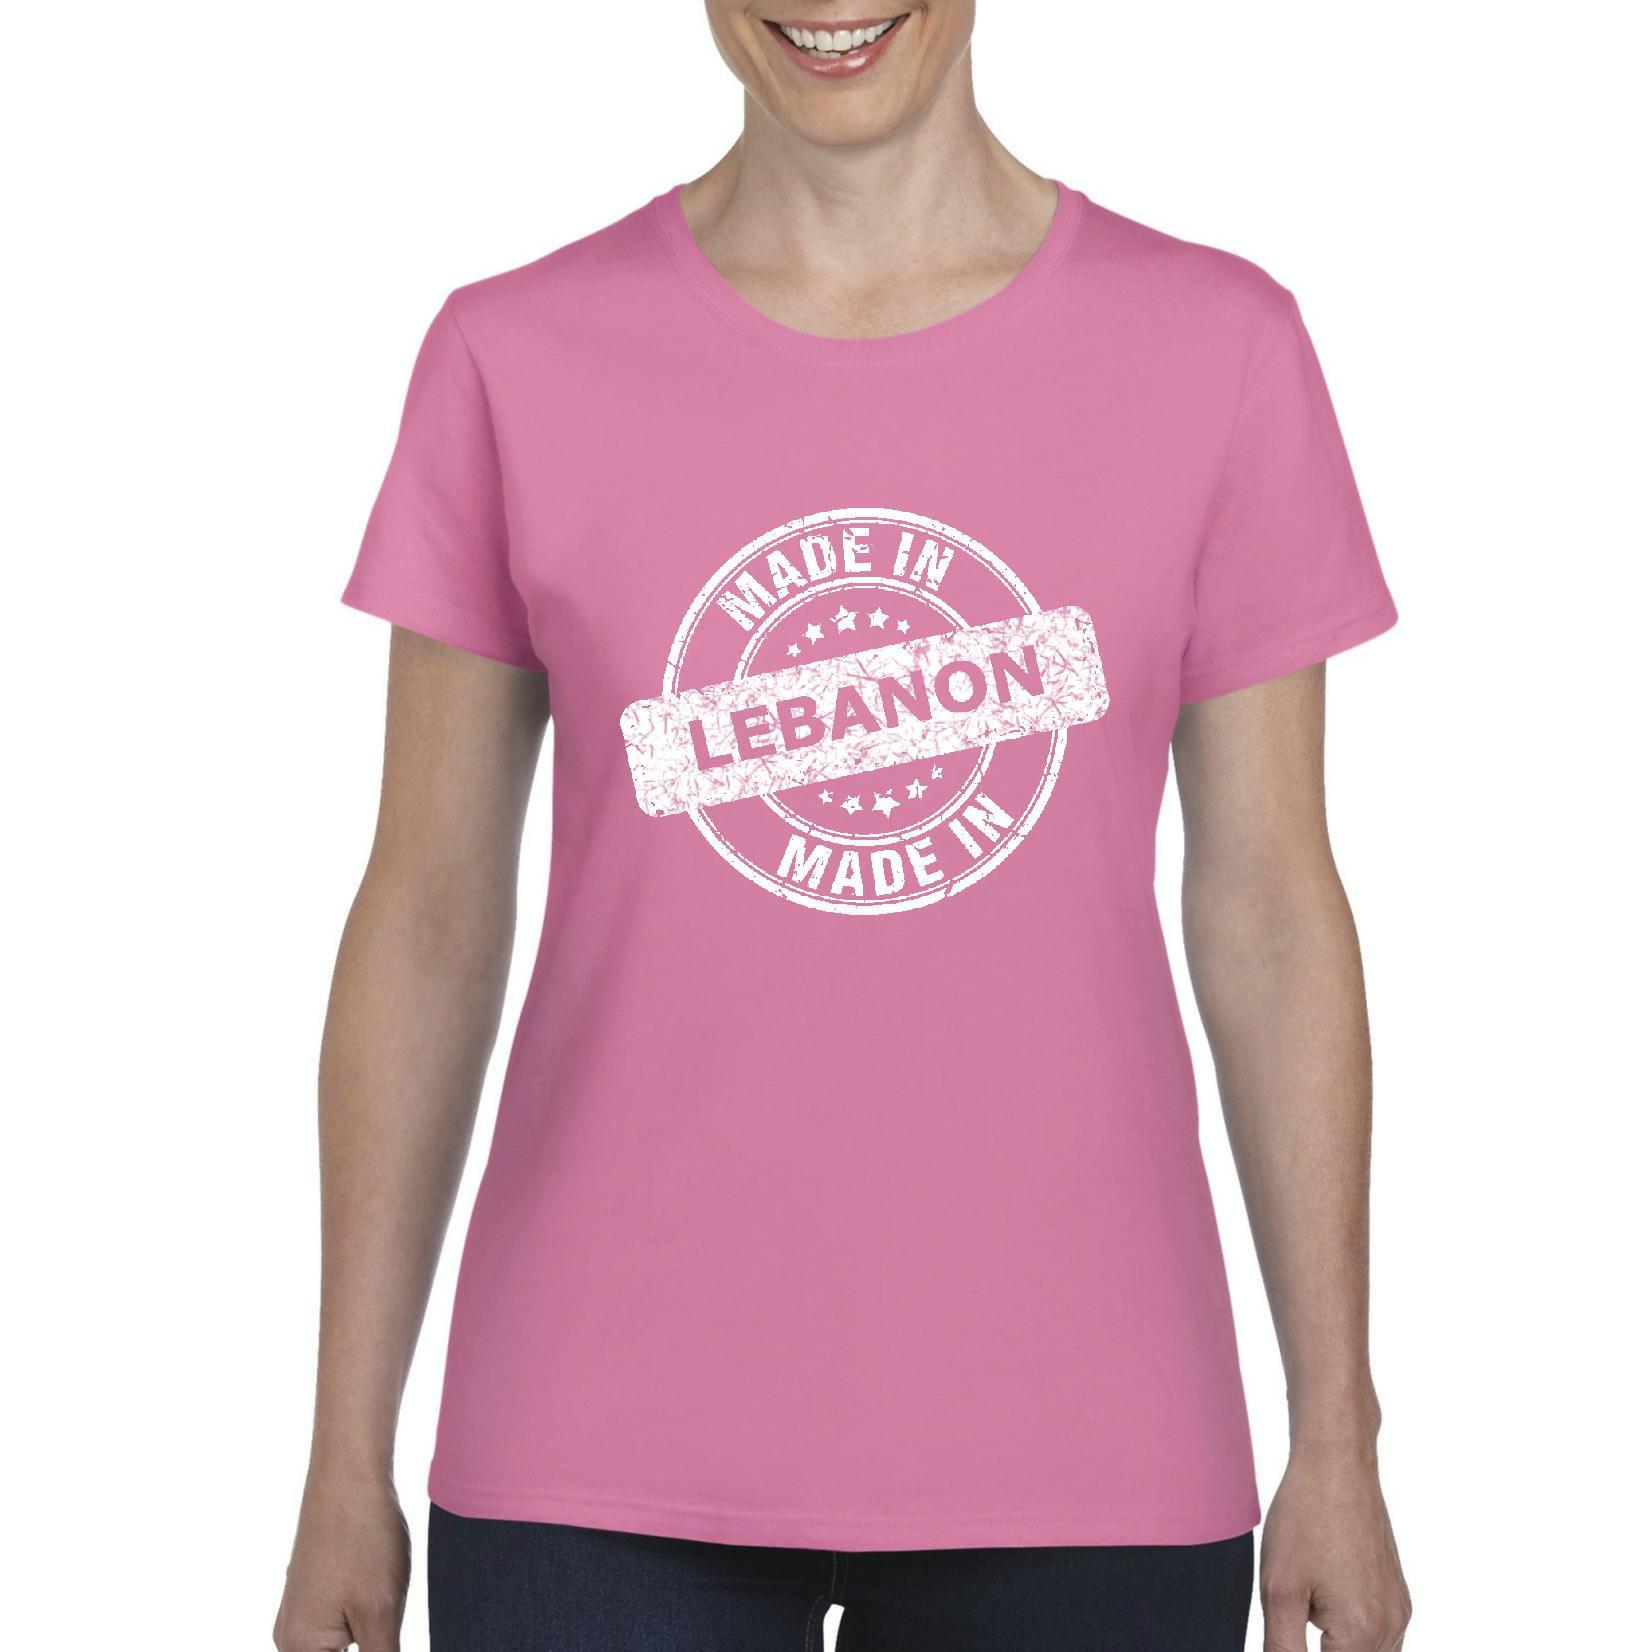 Lebanon T-Shirt Made in Lebanon Artix Women's T-shirt Tee Clothes